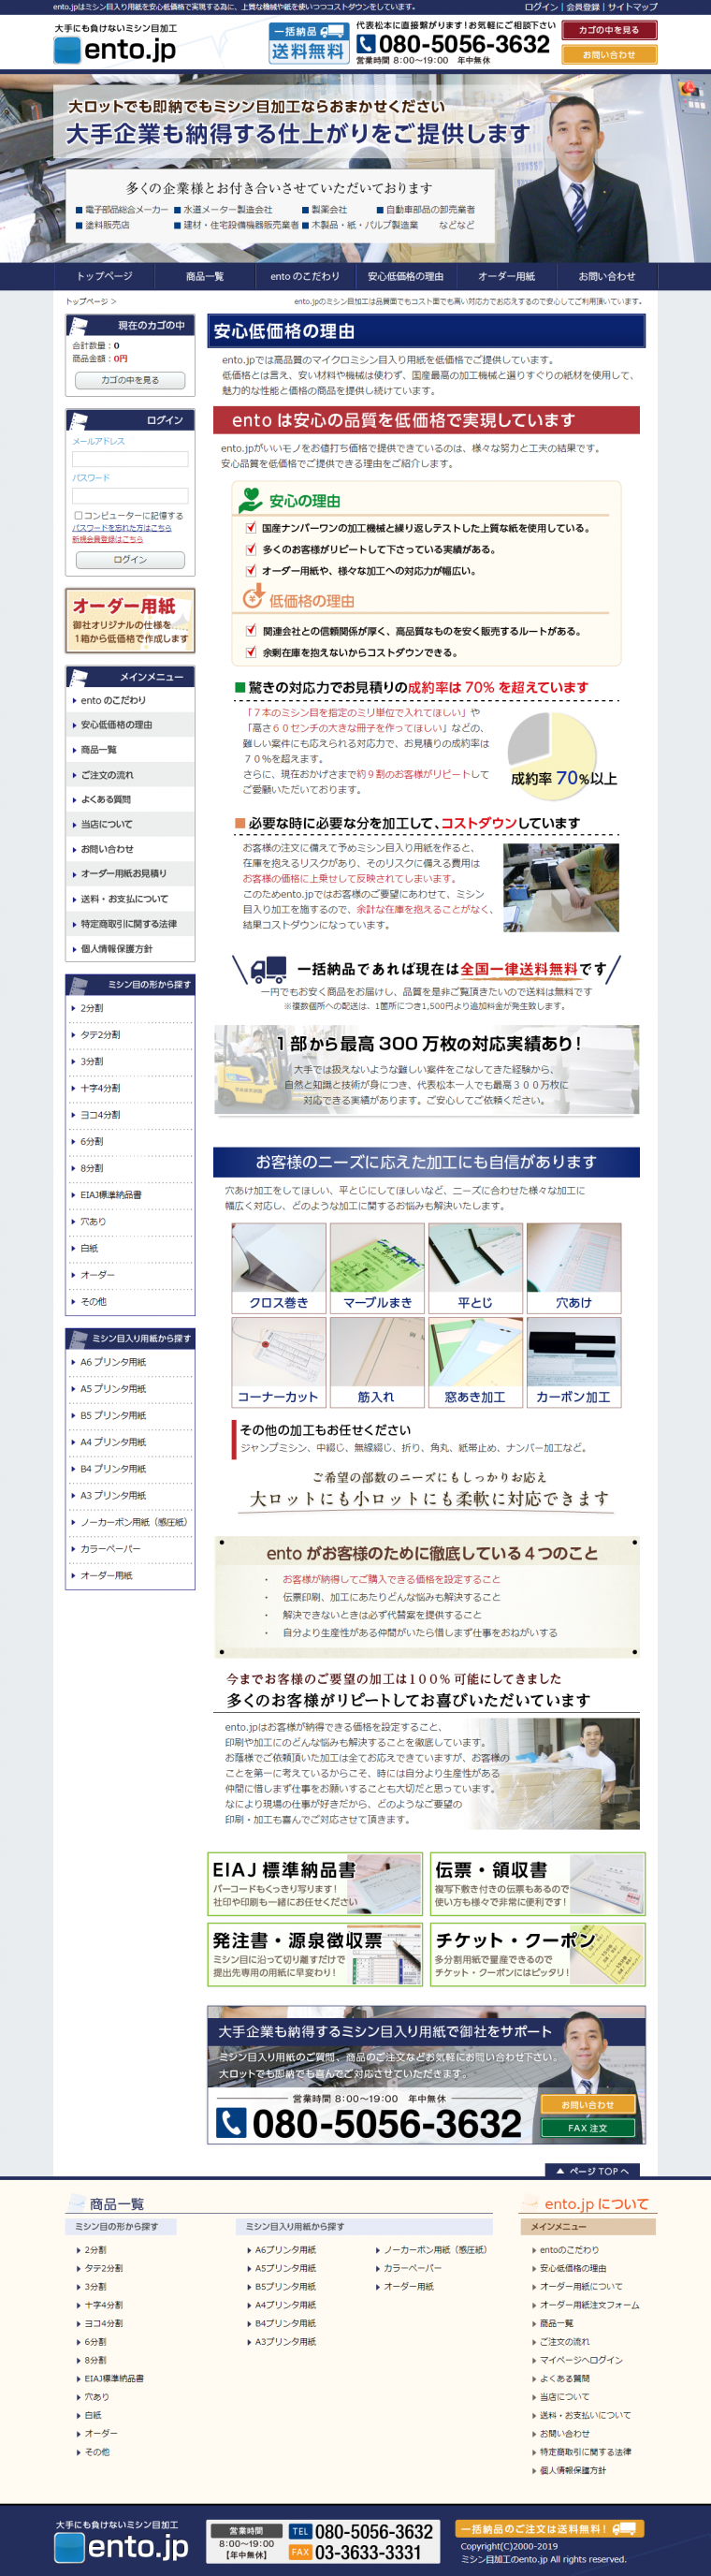 ento.jp